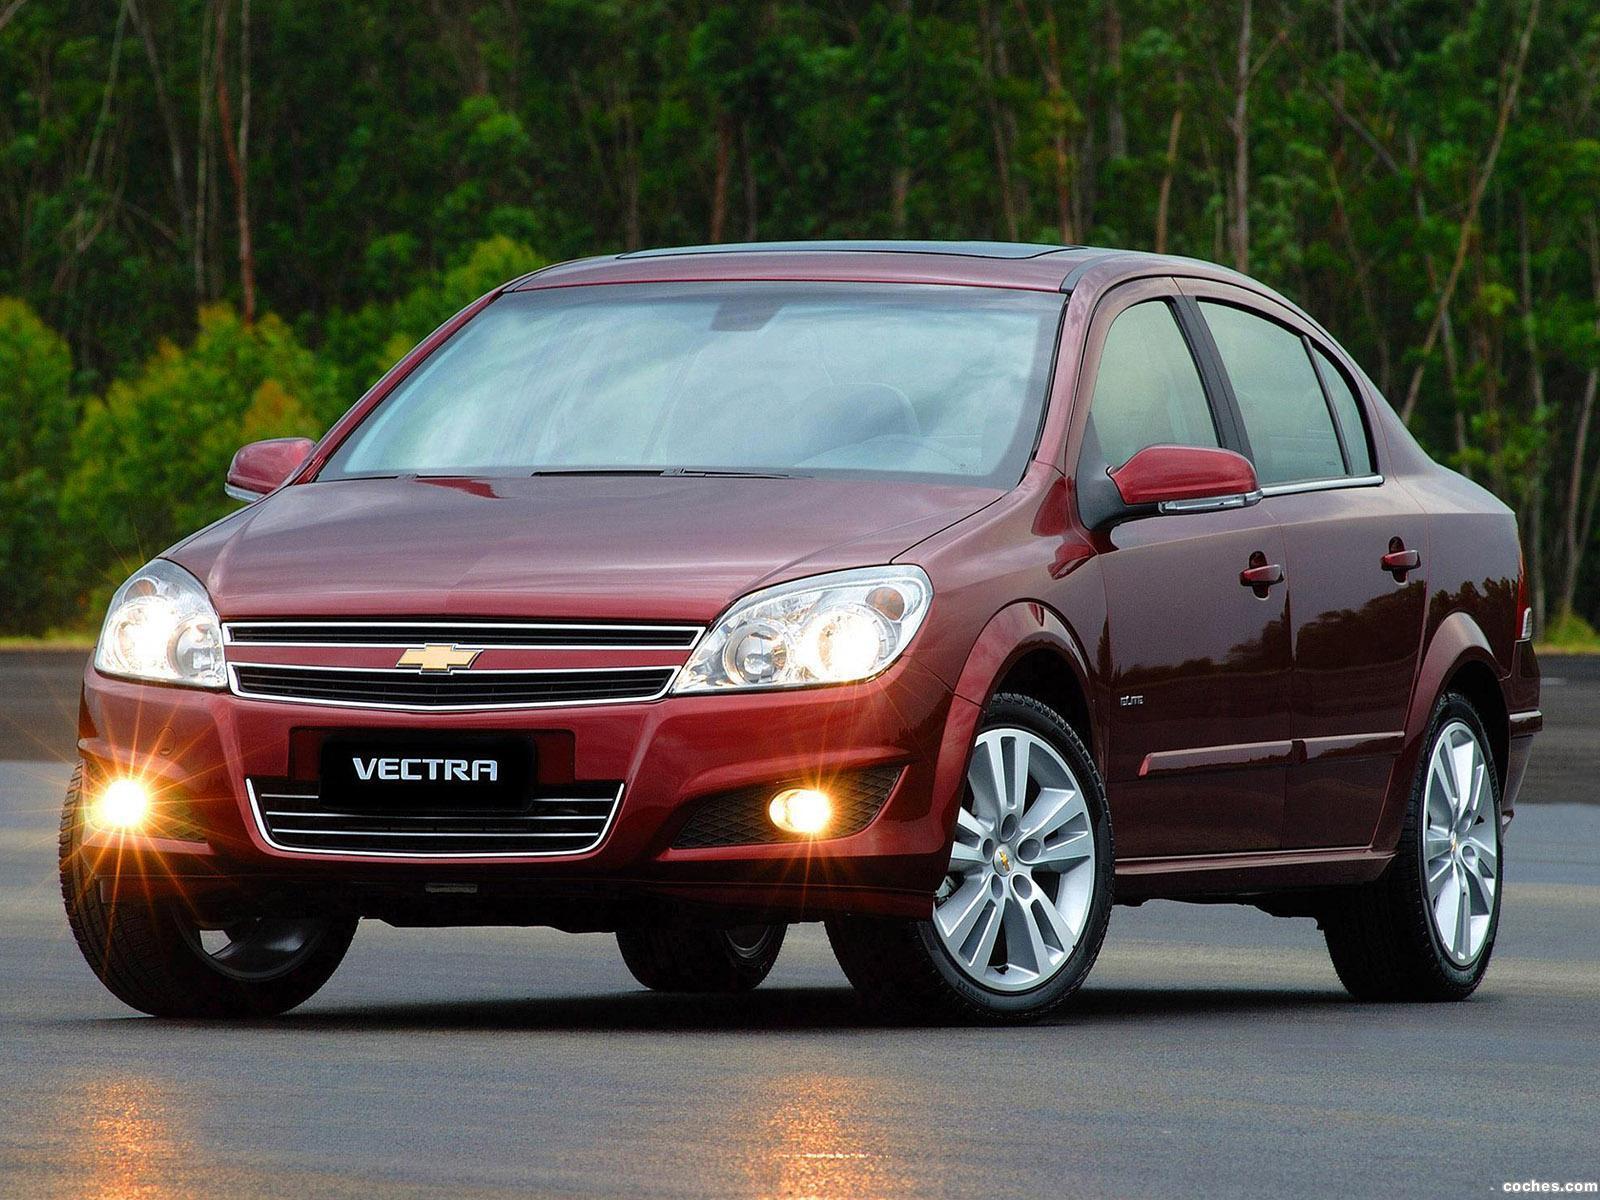 Foto 0 de Chevrolet Vectra 2009